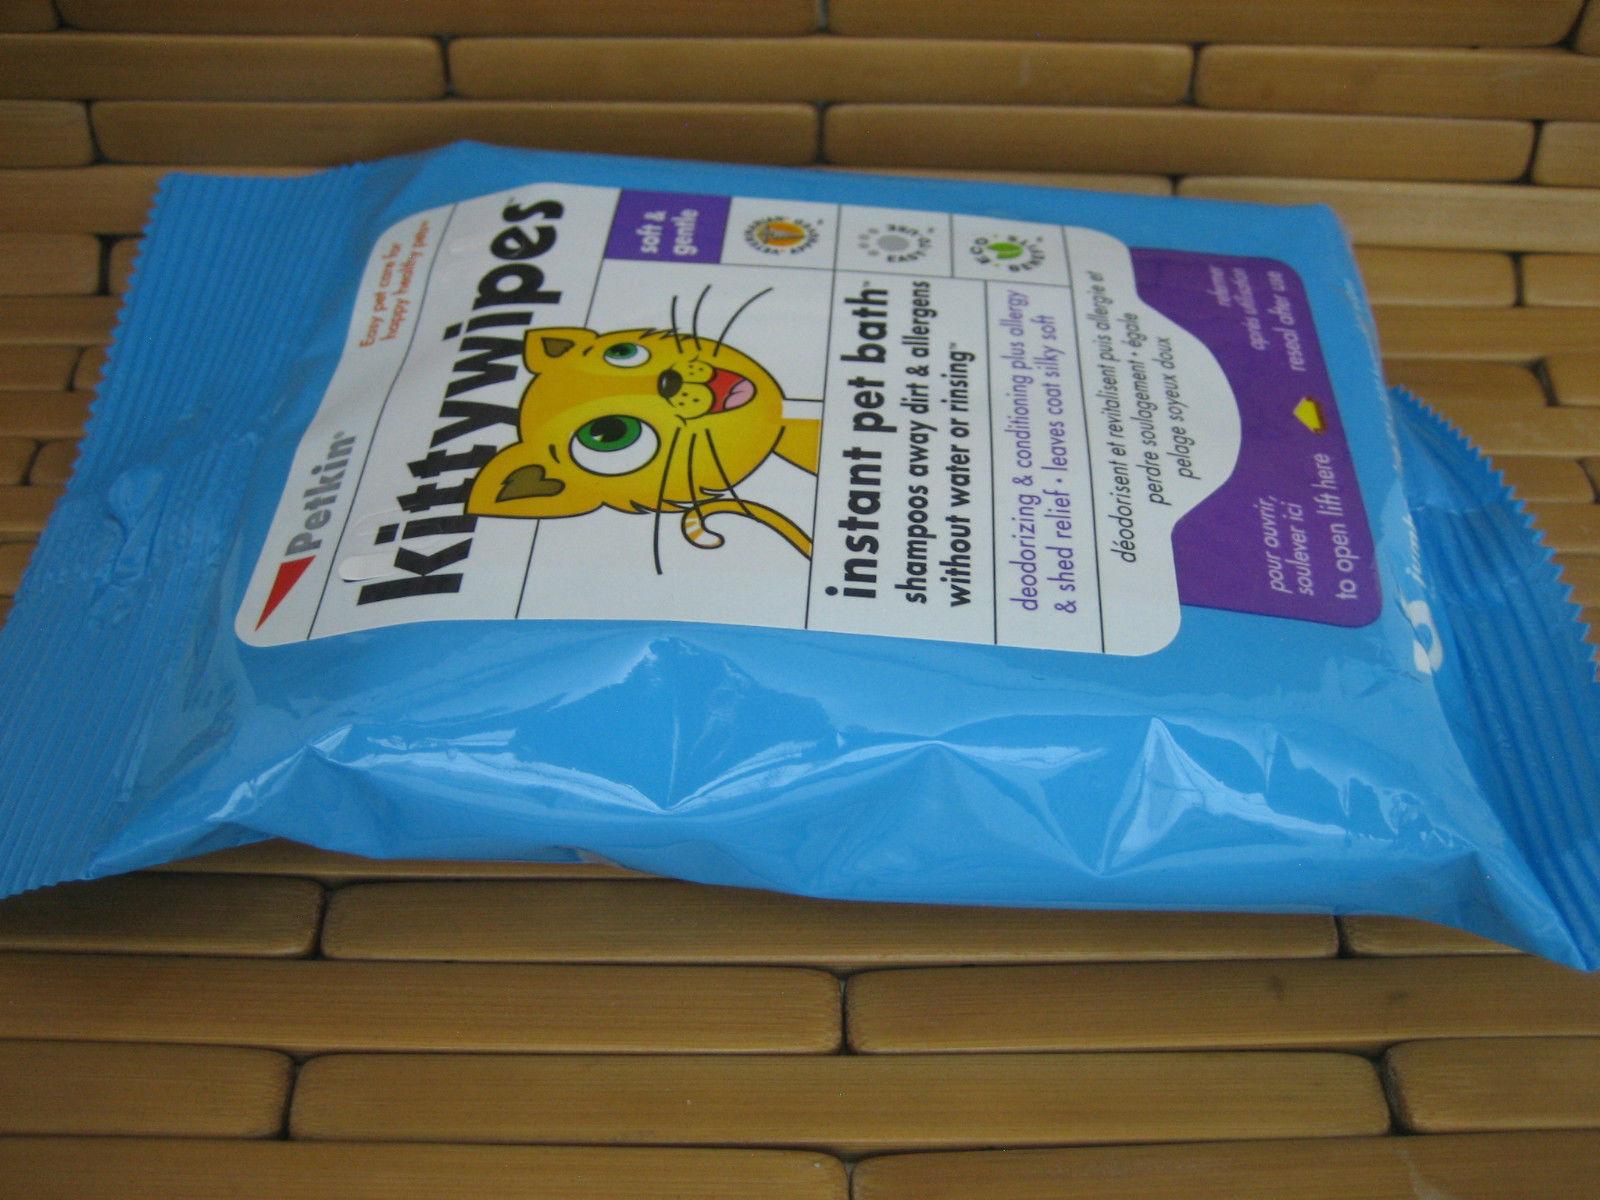 PETKIN KITTYWIPES KITTY WIPES PREWET MOISTENED SOFT GENTLE SHAMPOO NO WATER